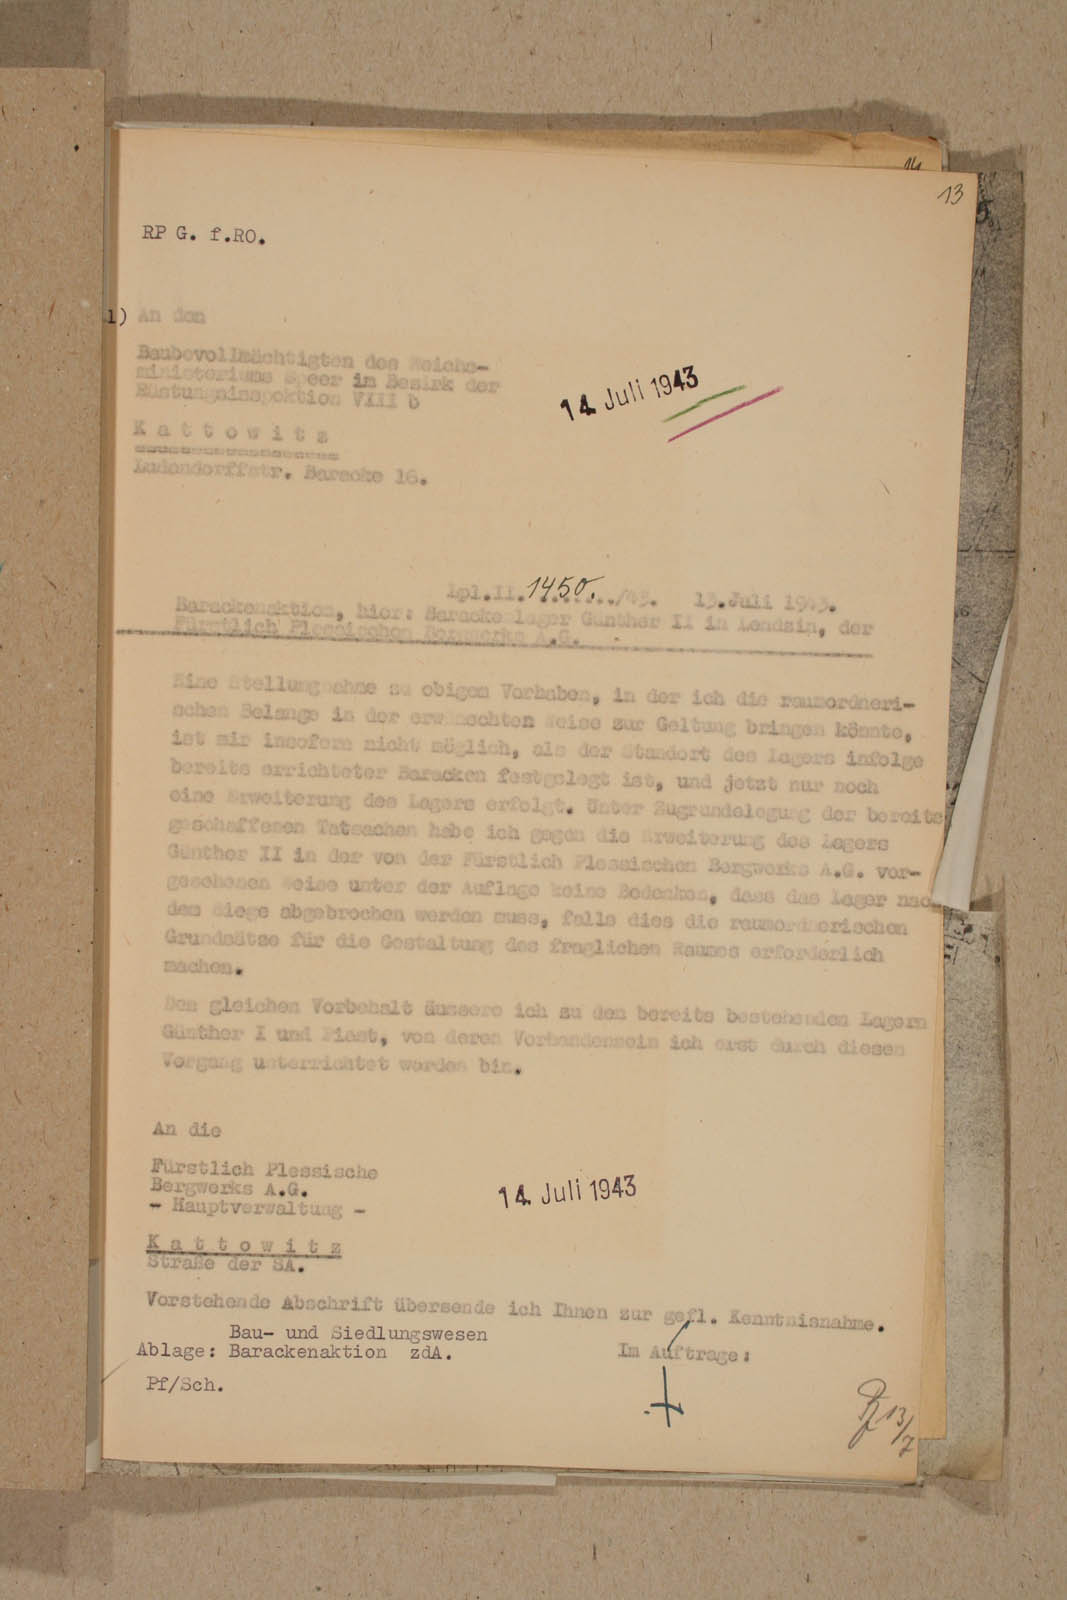 Archiwum Panstwowe w Katowicach Land Pl 12 120 708 13